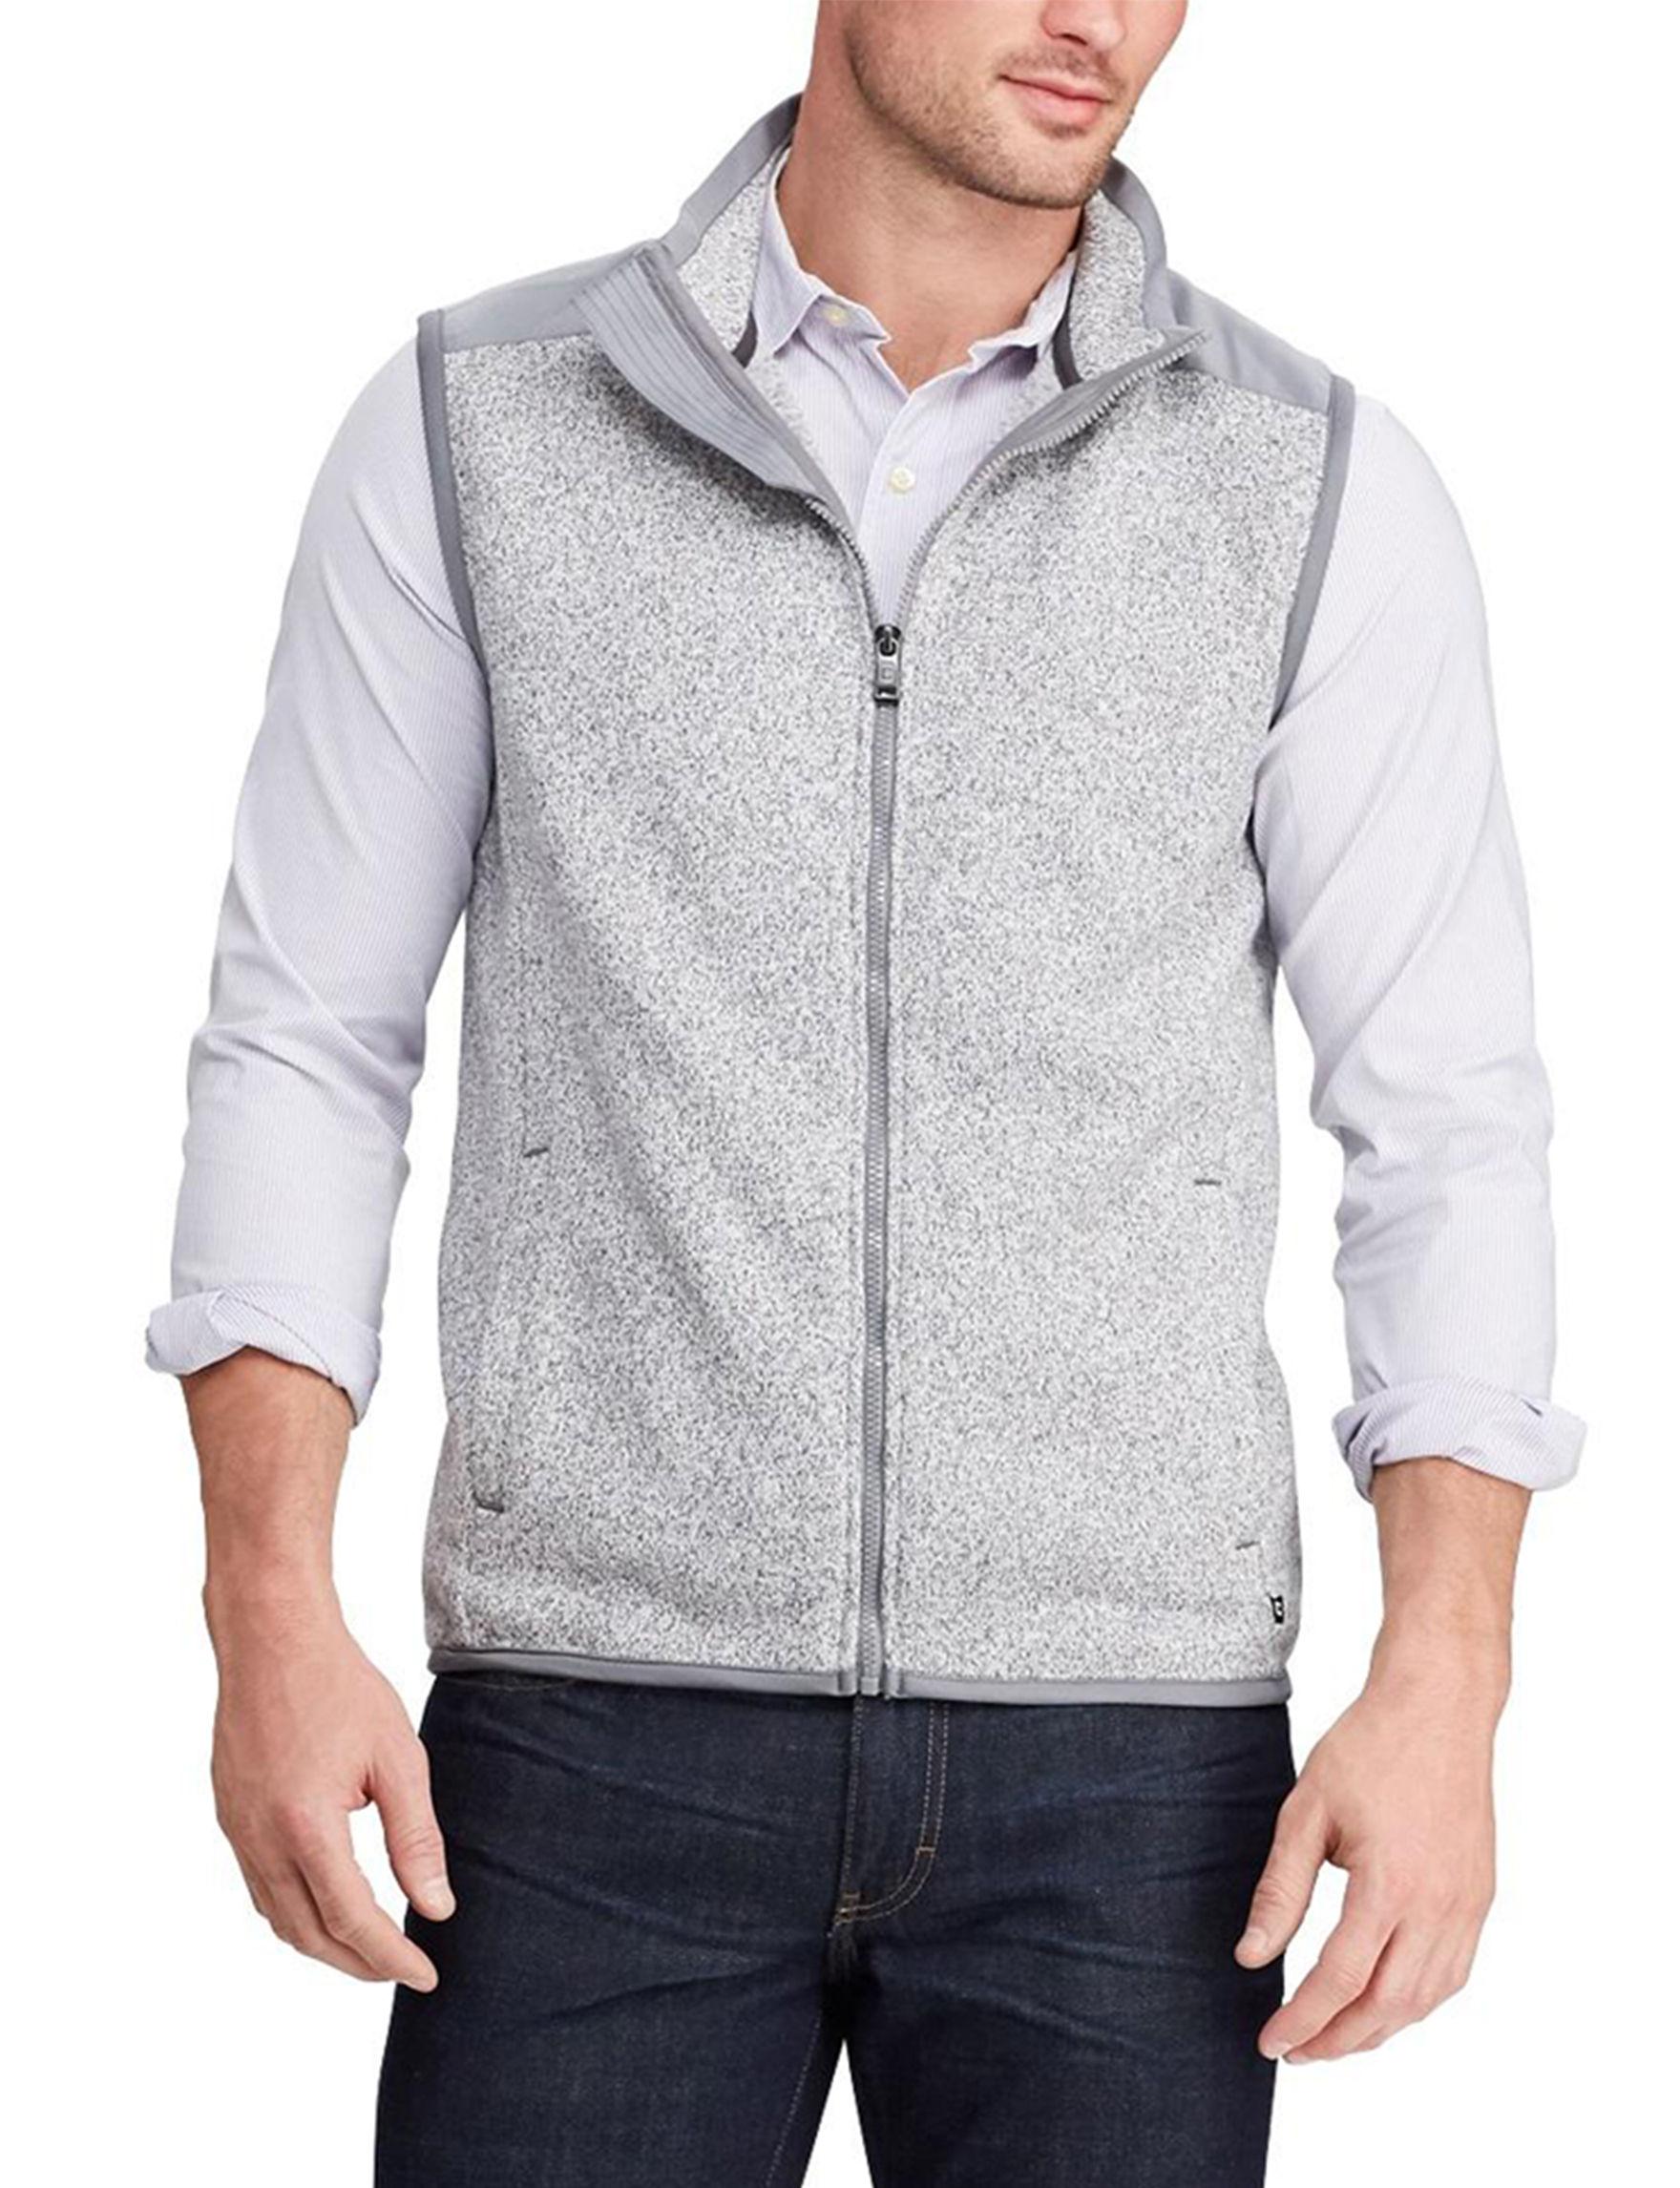 Chaps Light Grey Sweater Vests